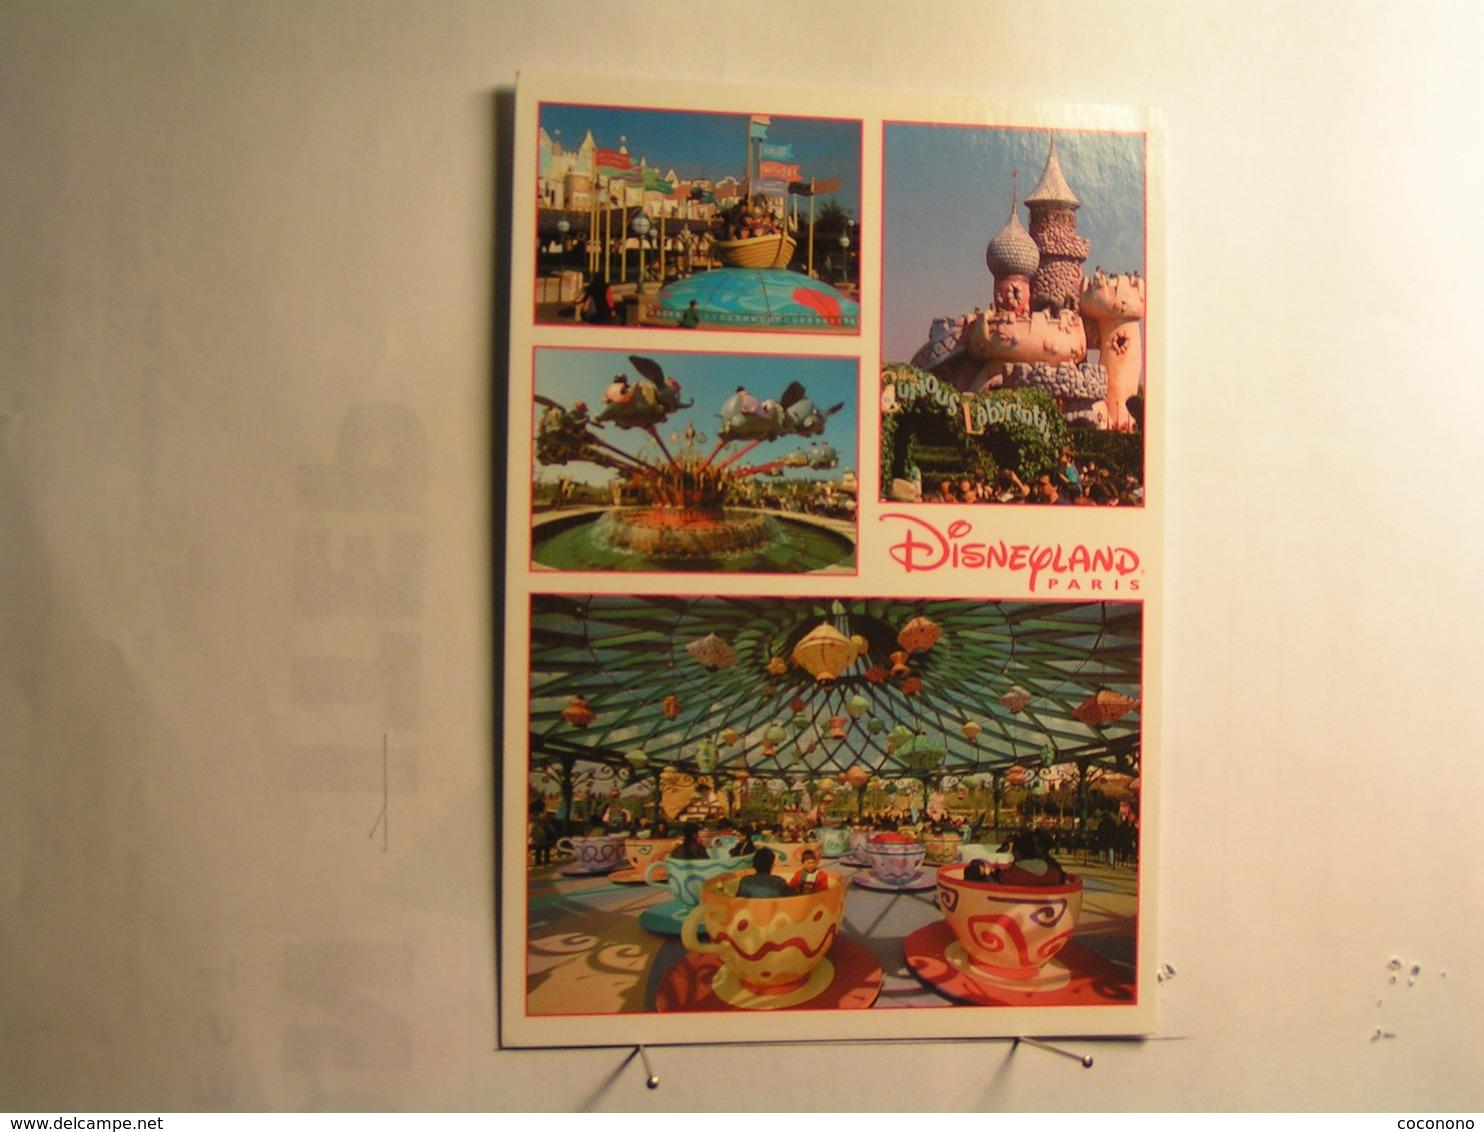 Disneyland - Paris - Fantasyland - Disneyland